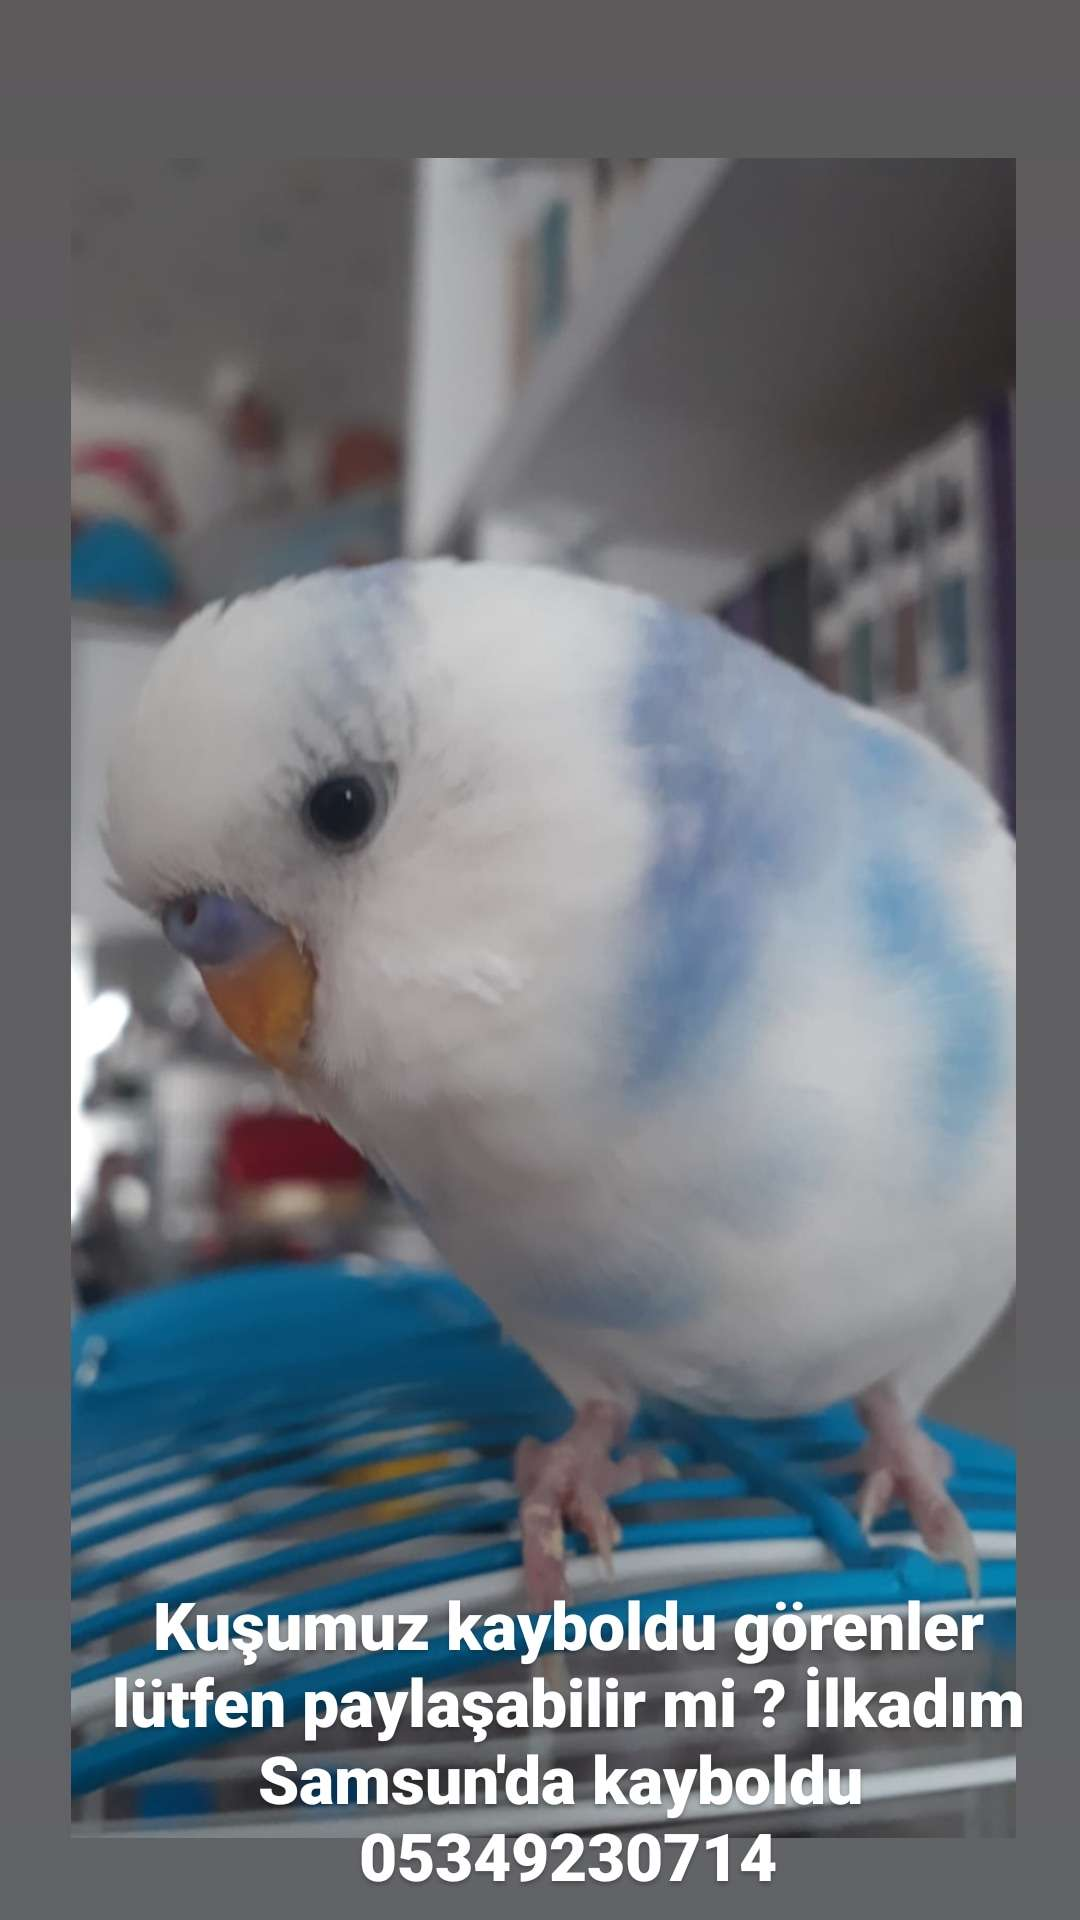 Muhabbet kuşum kayboldu